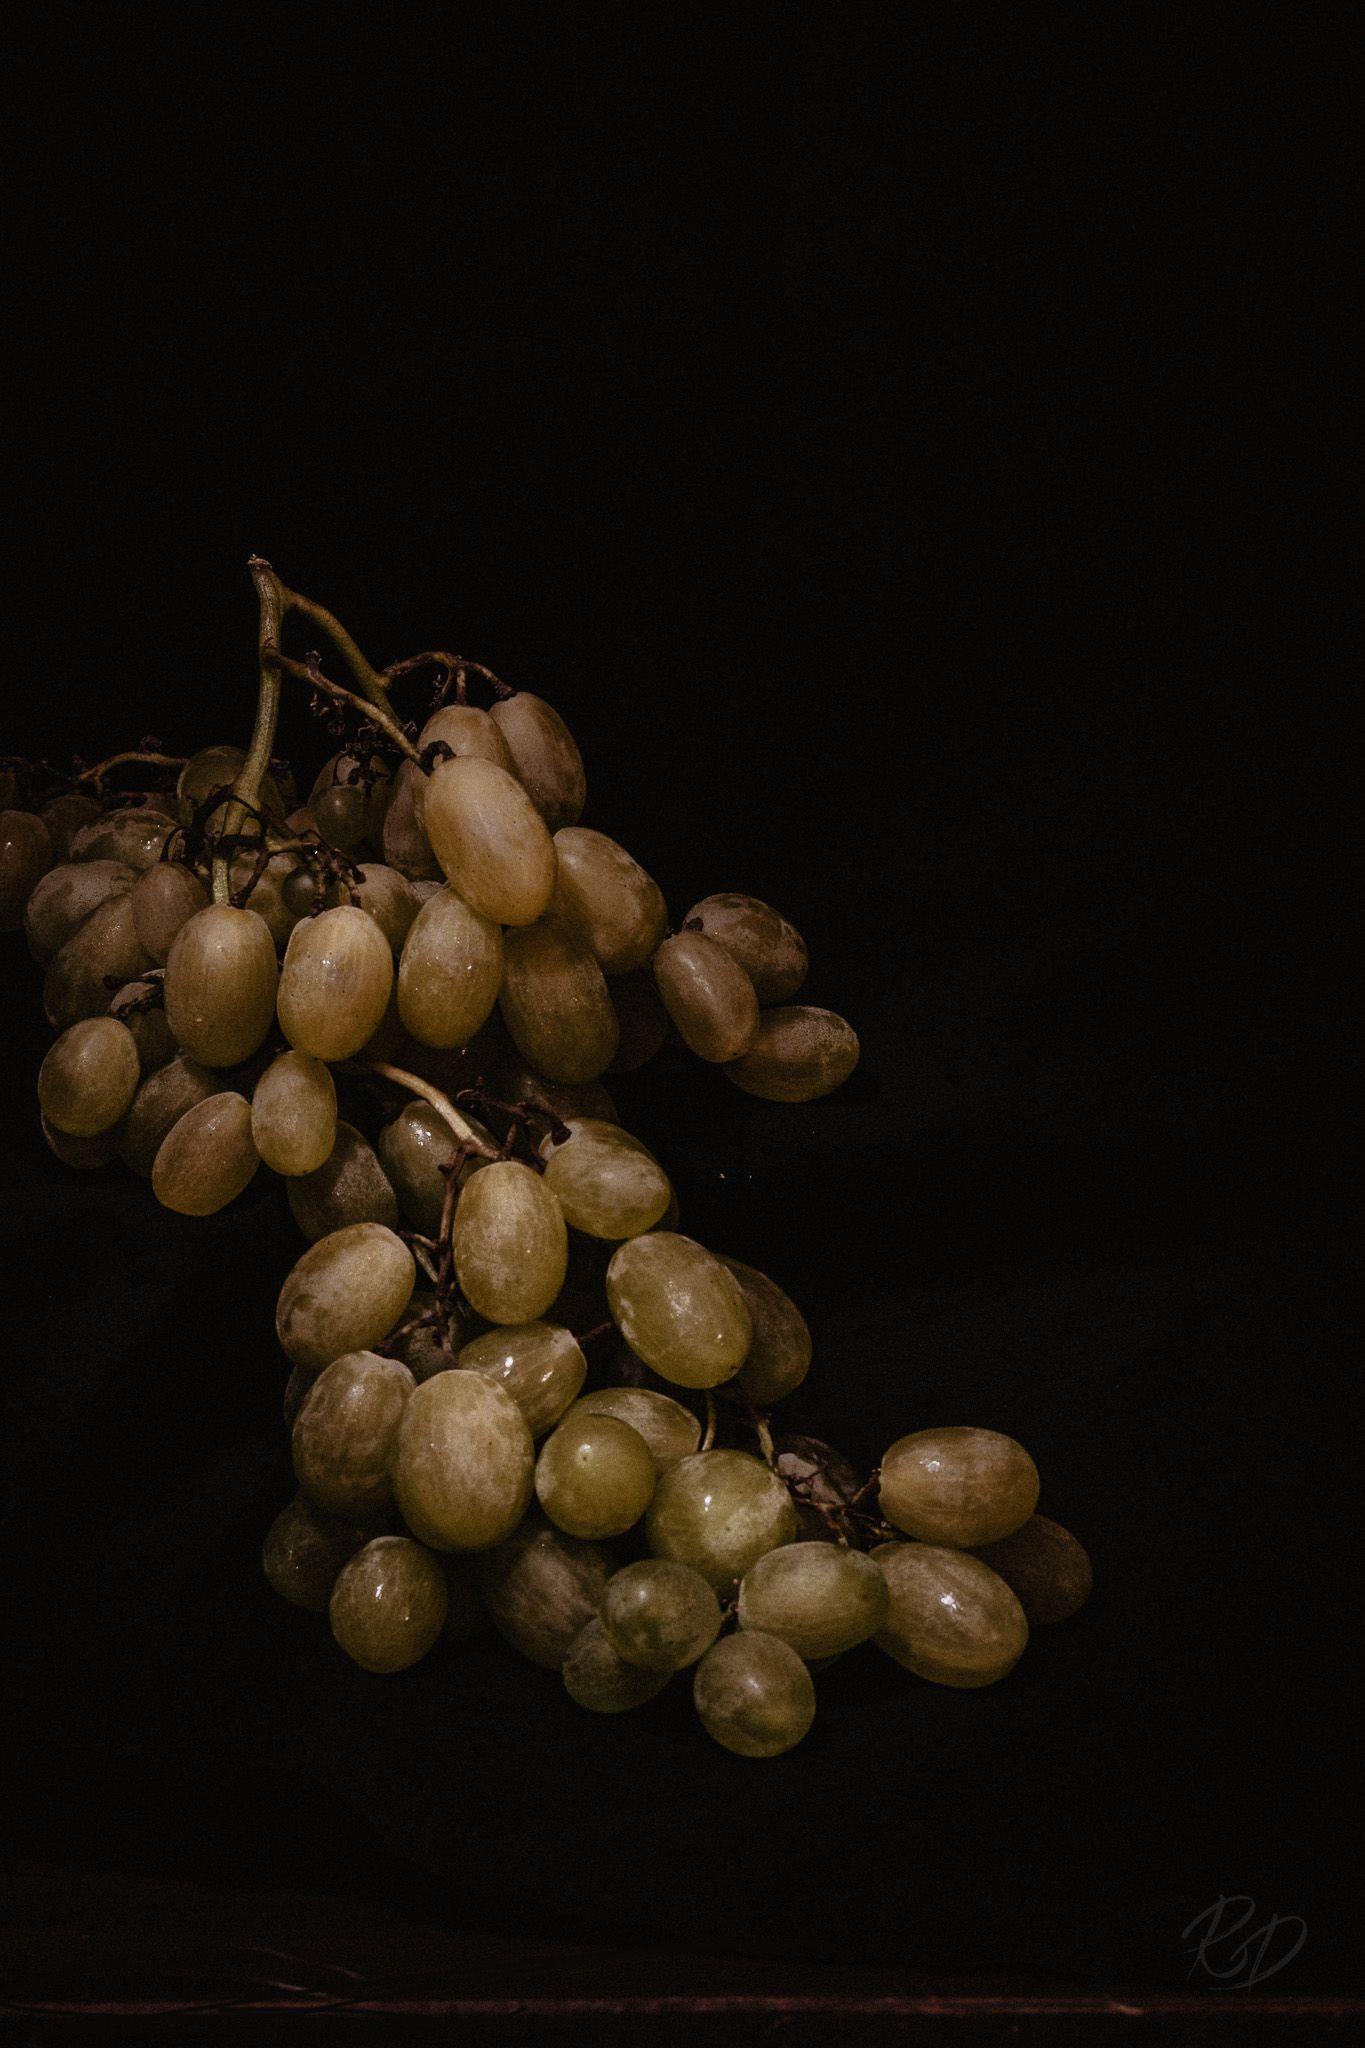 Still Life Food Food Photography Grapes Dark Food Photography